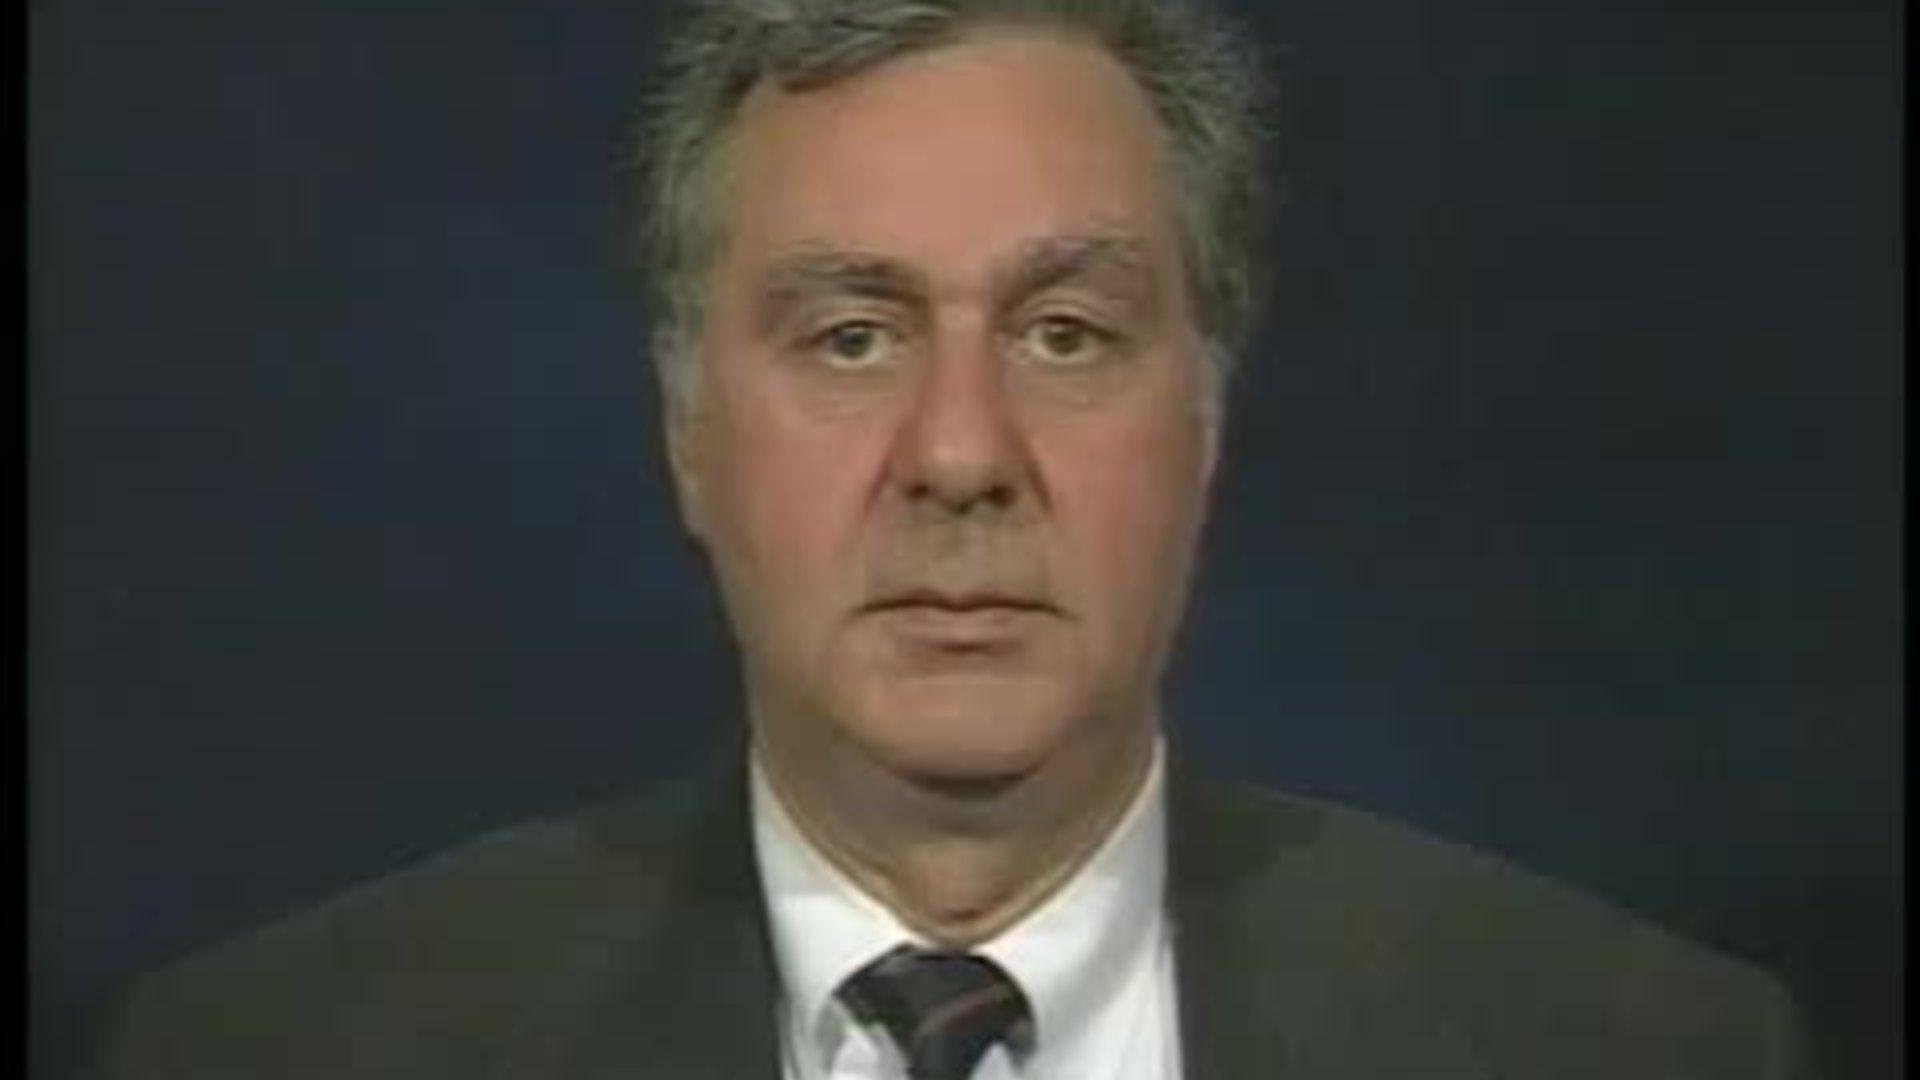 Representative Dick Armey